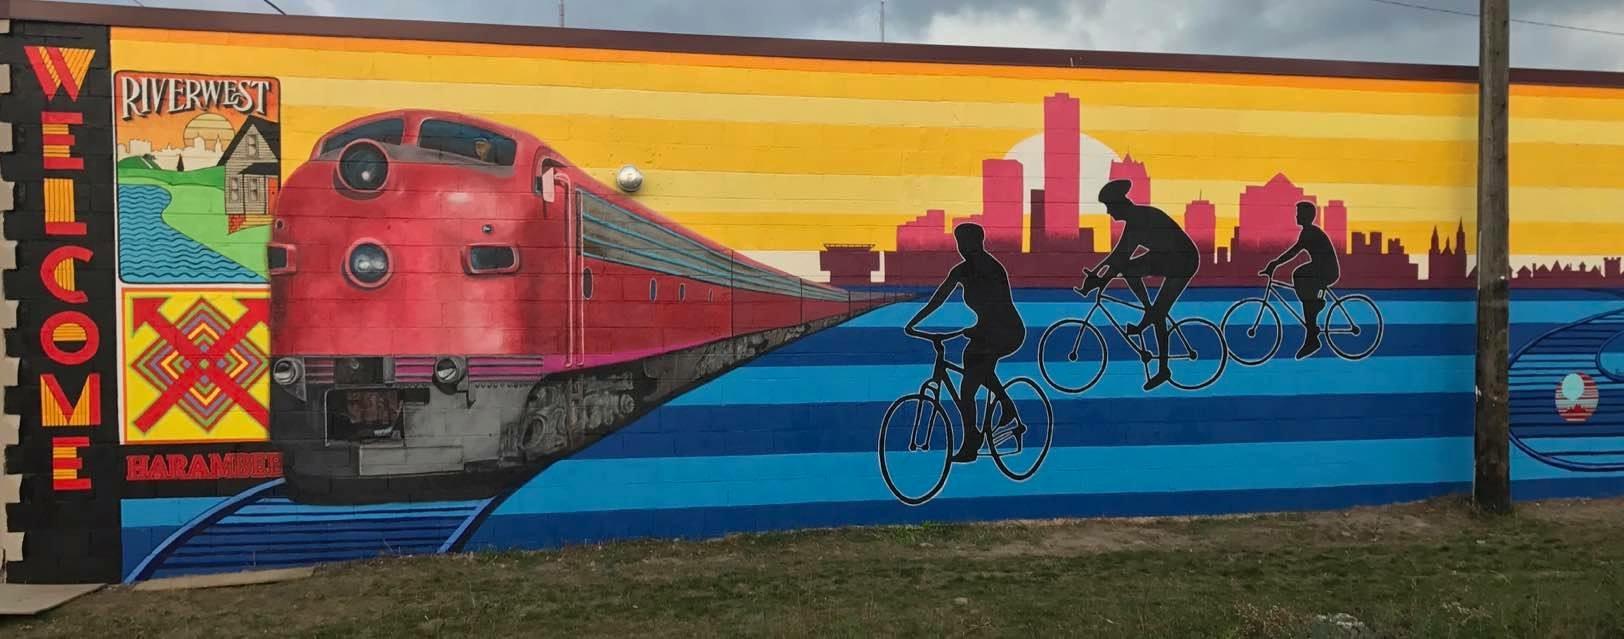 beerline mural